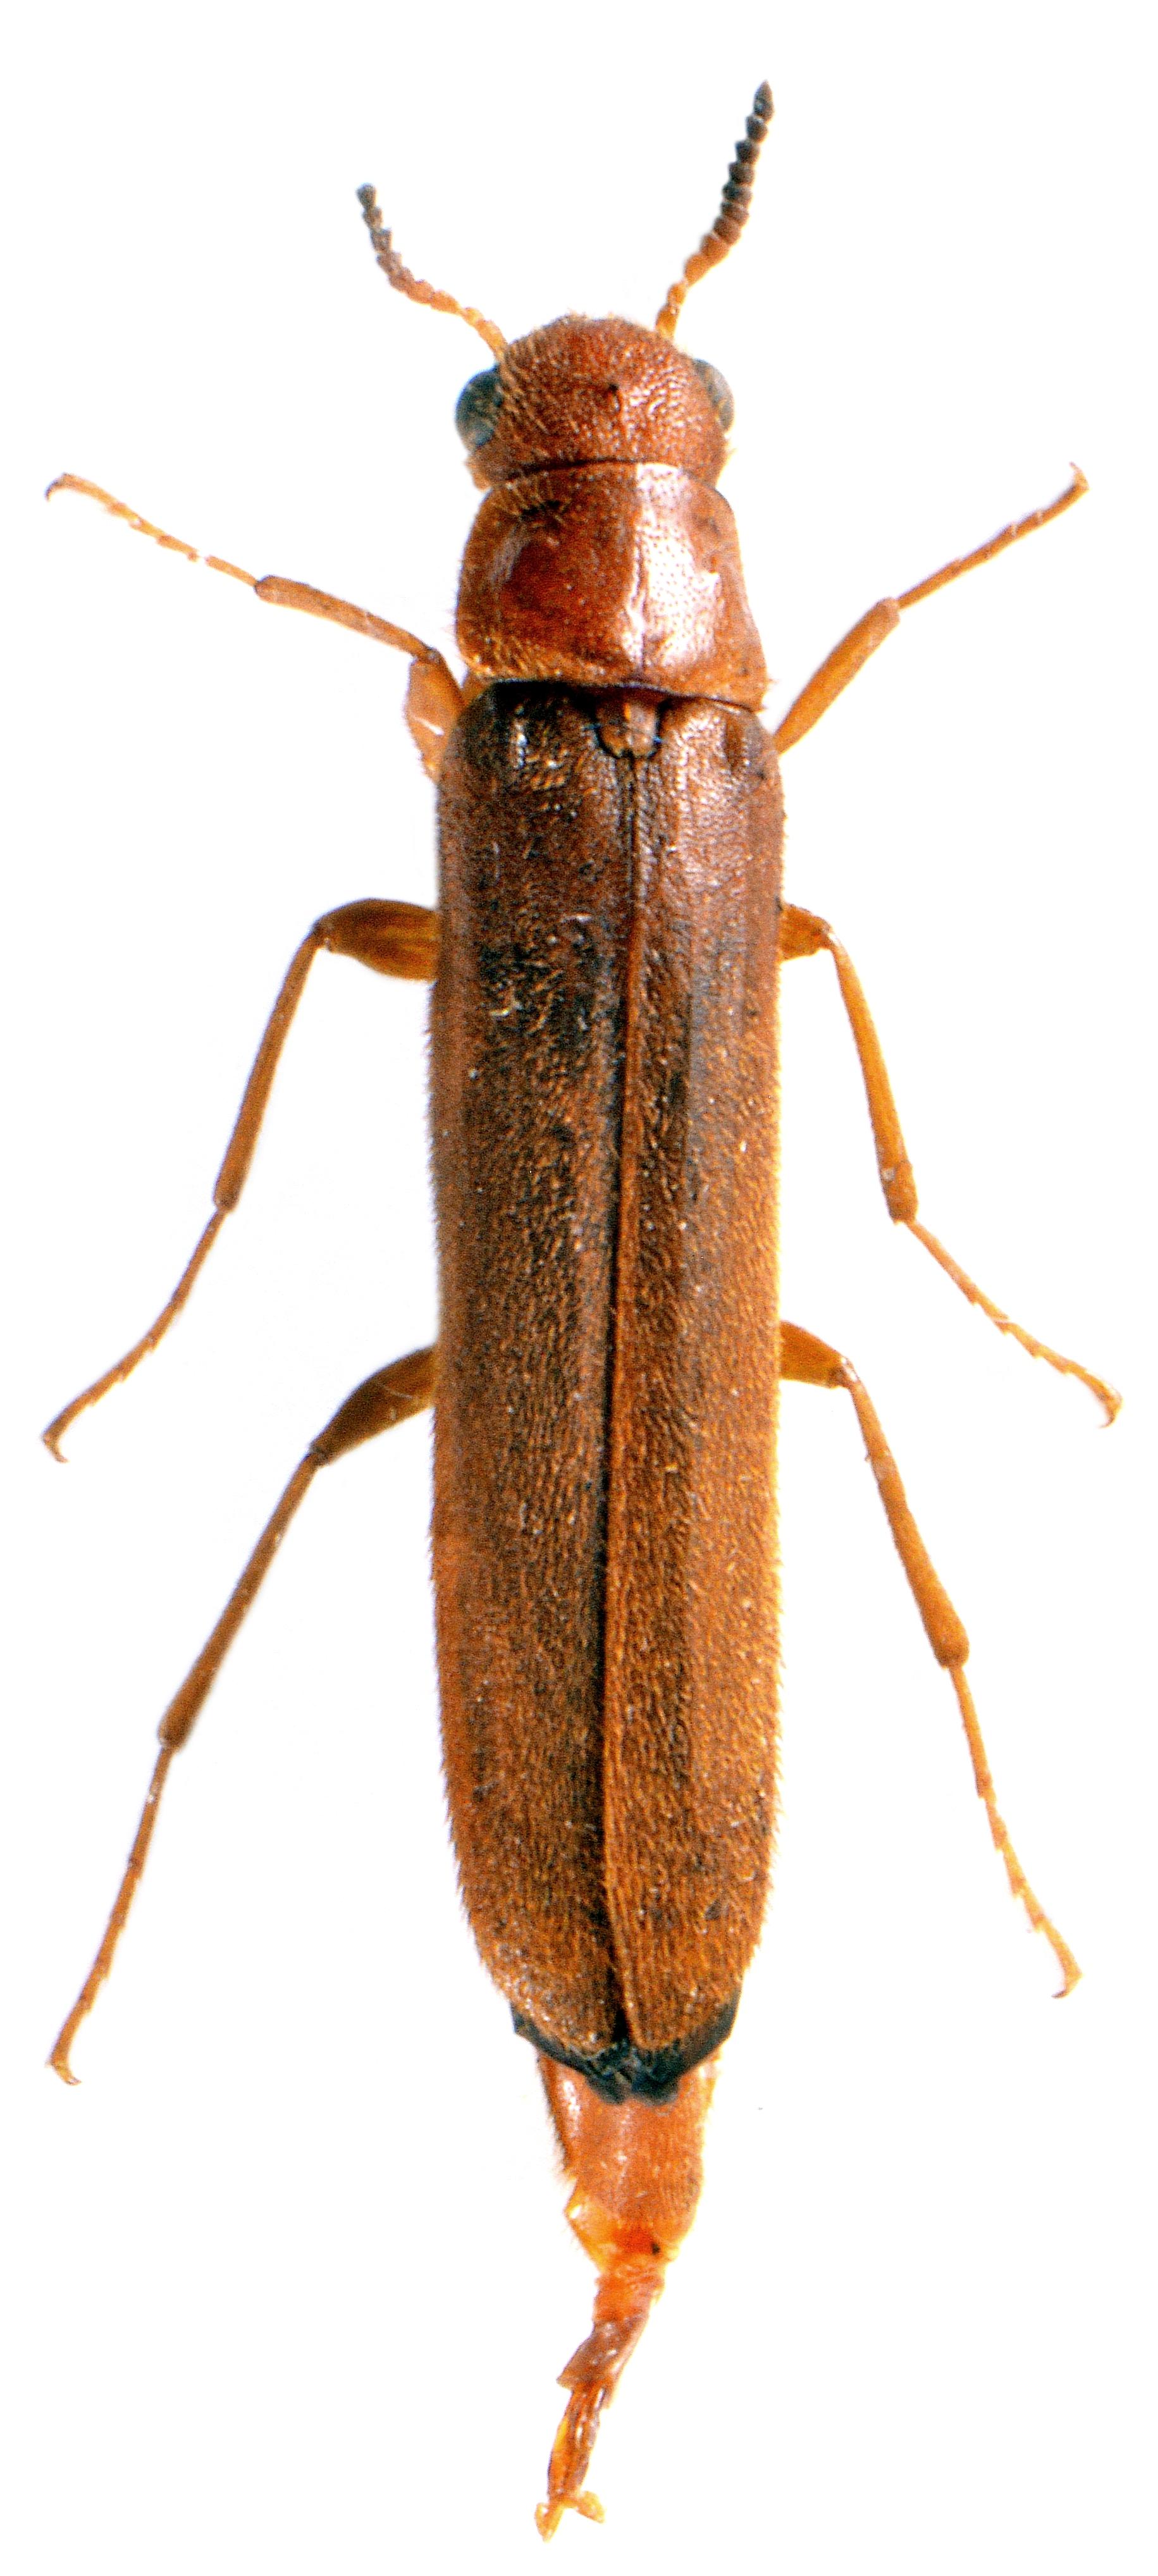 Hylecoetus dermestoides ♀